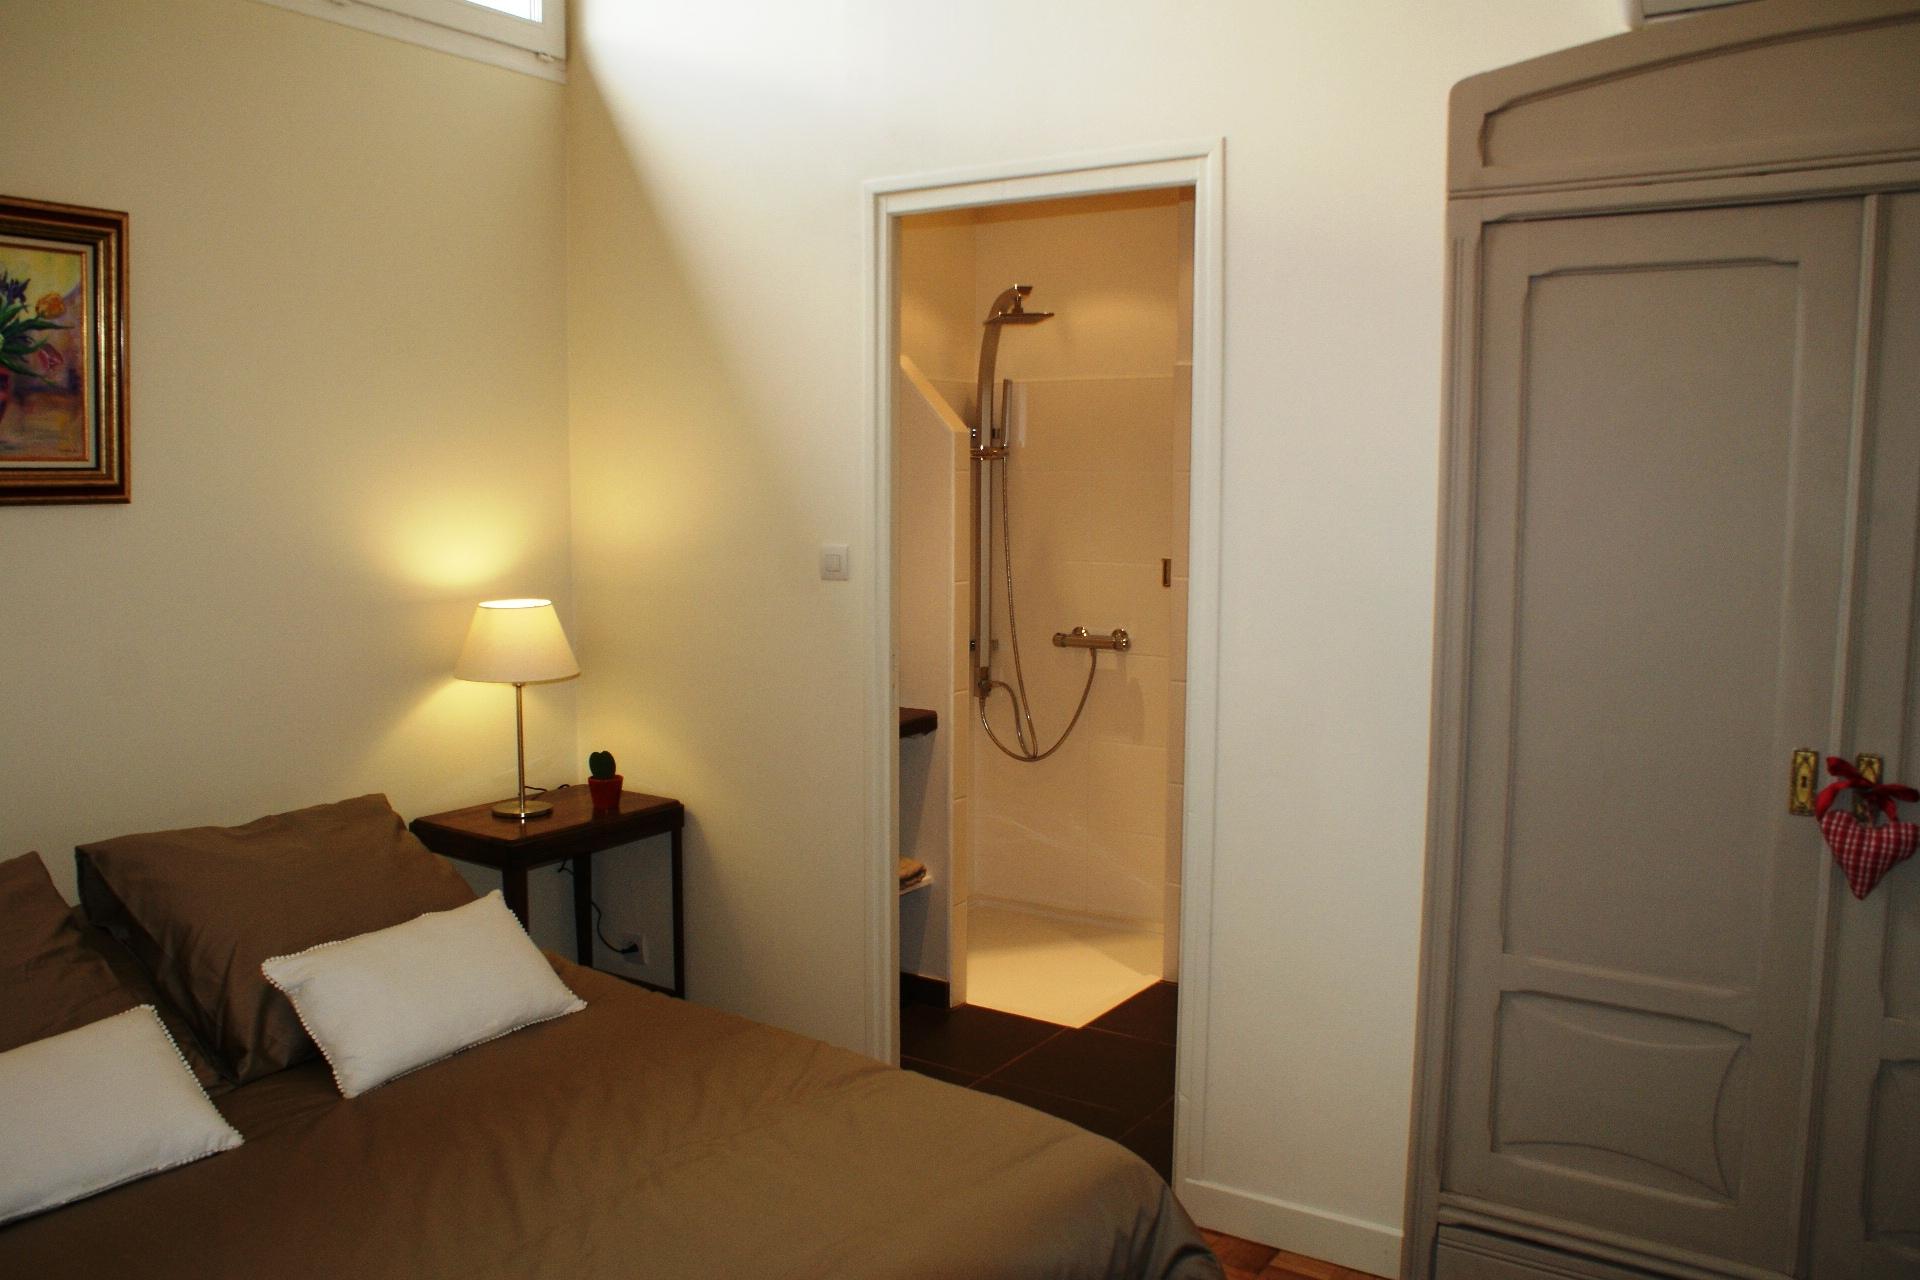 Les chambres de Metz La Maxe chambres d h´tes Metz